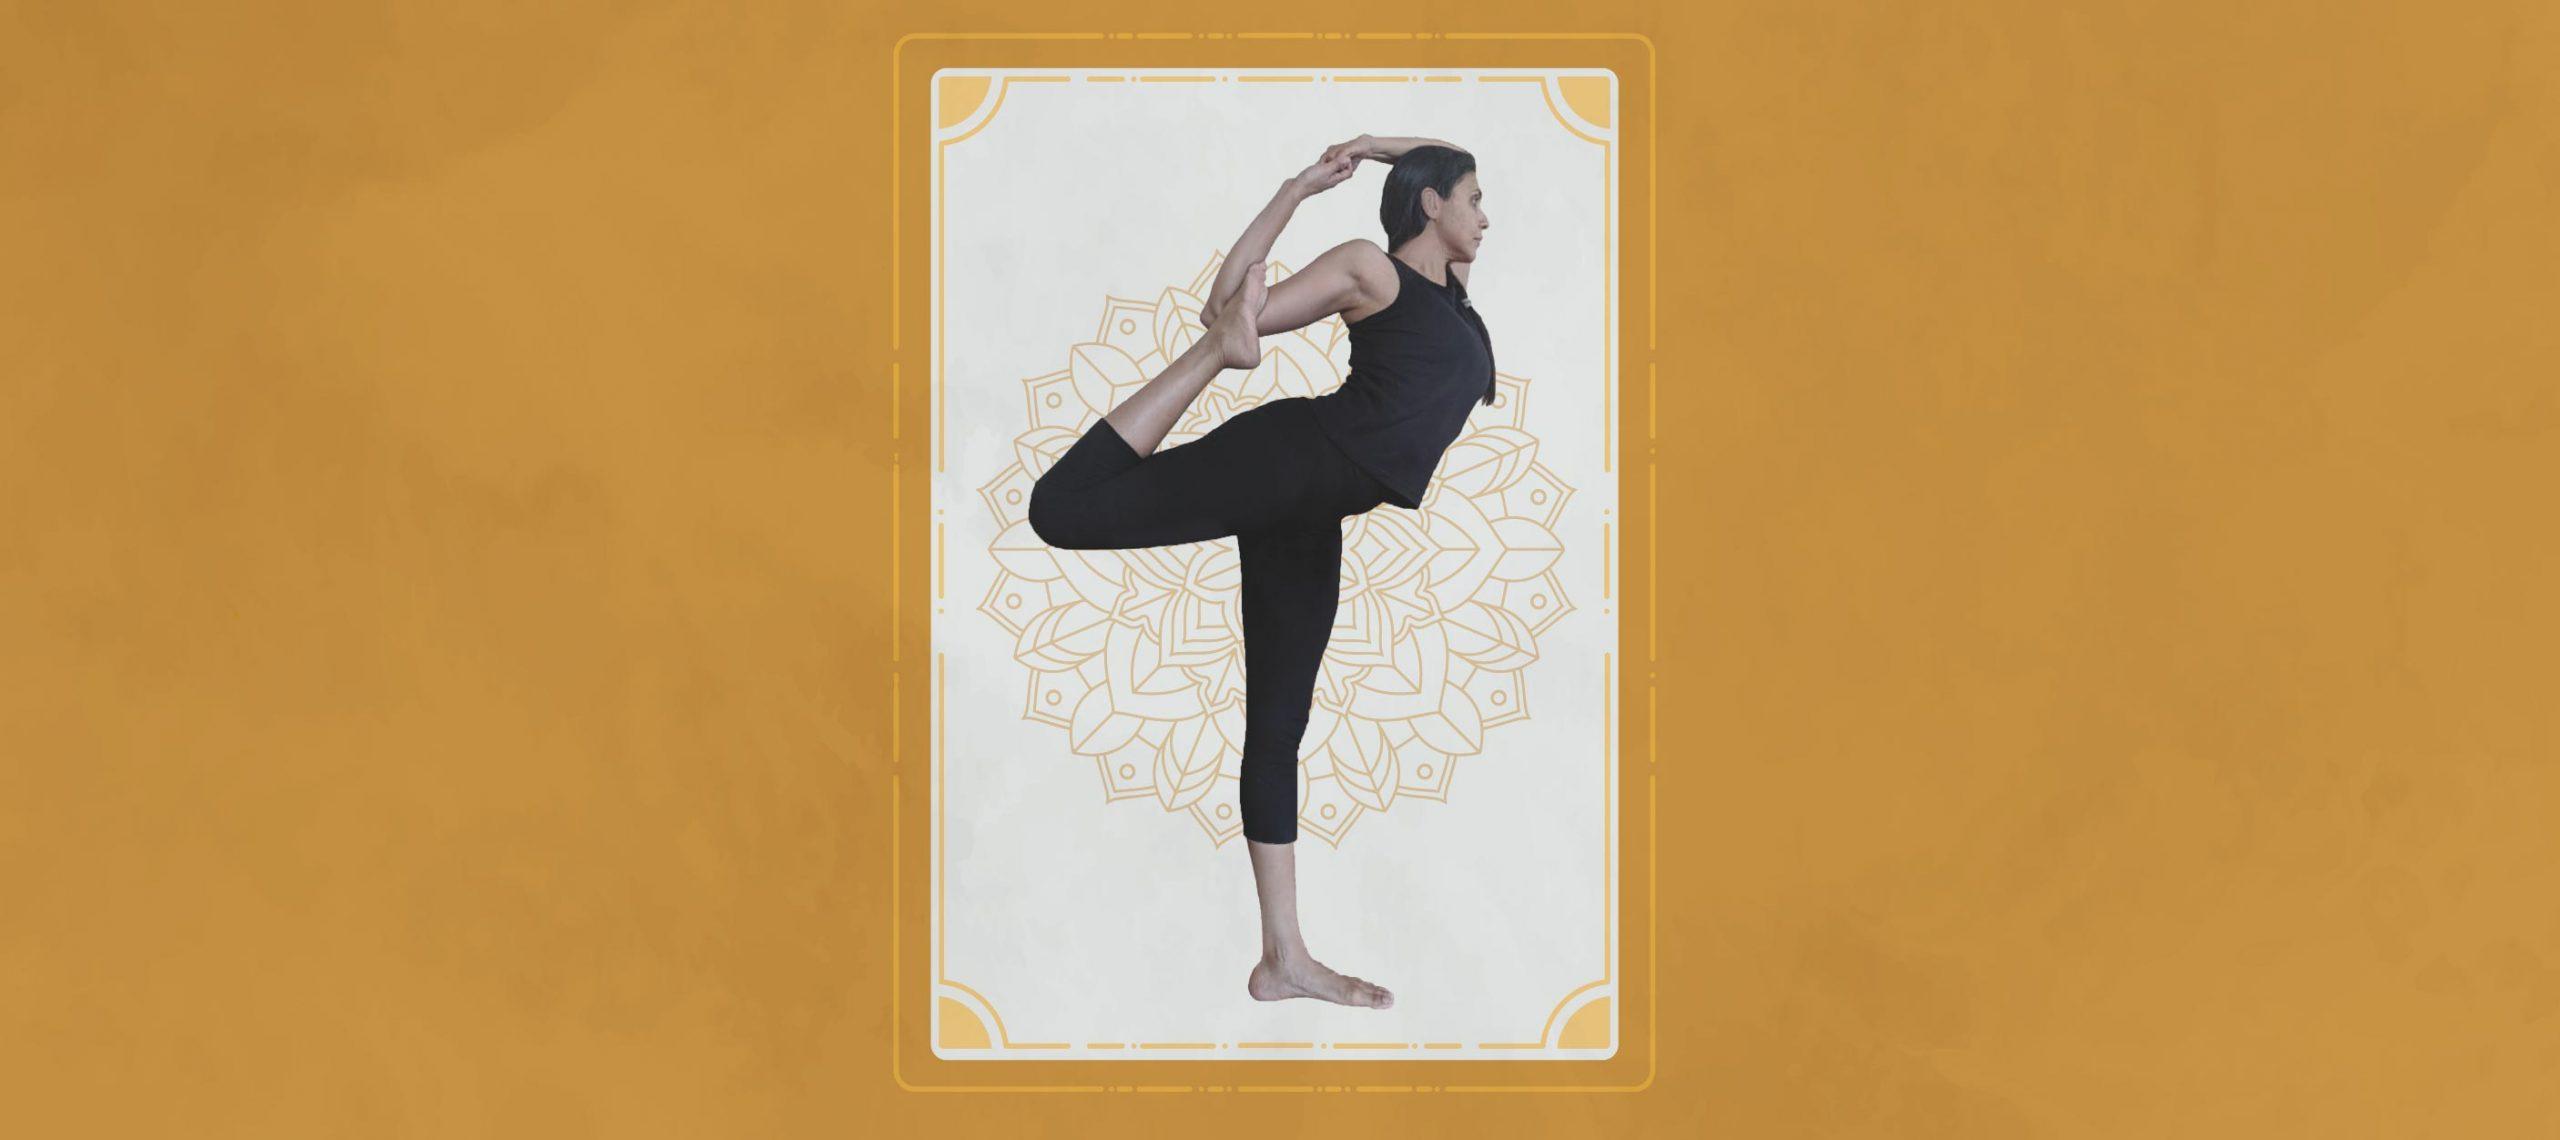 RYT200- AugWE Best yoga teacher training in Bangalore - a1000yoga Academy